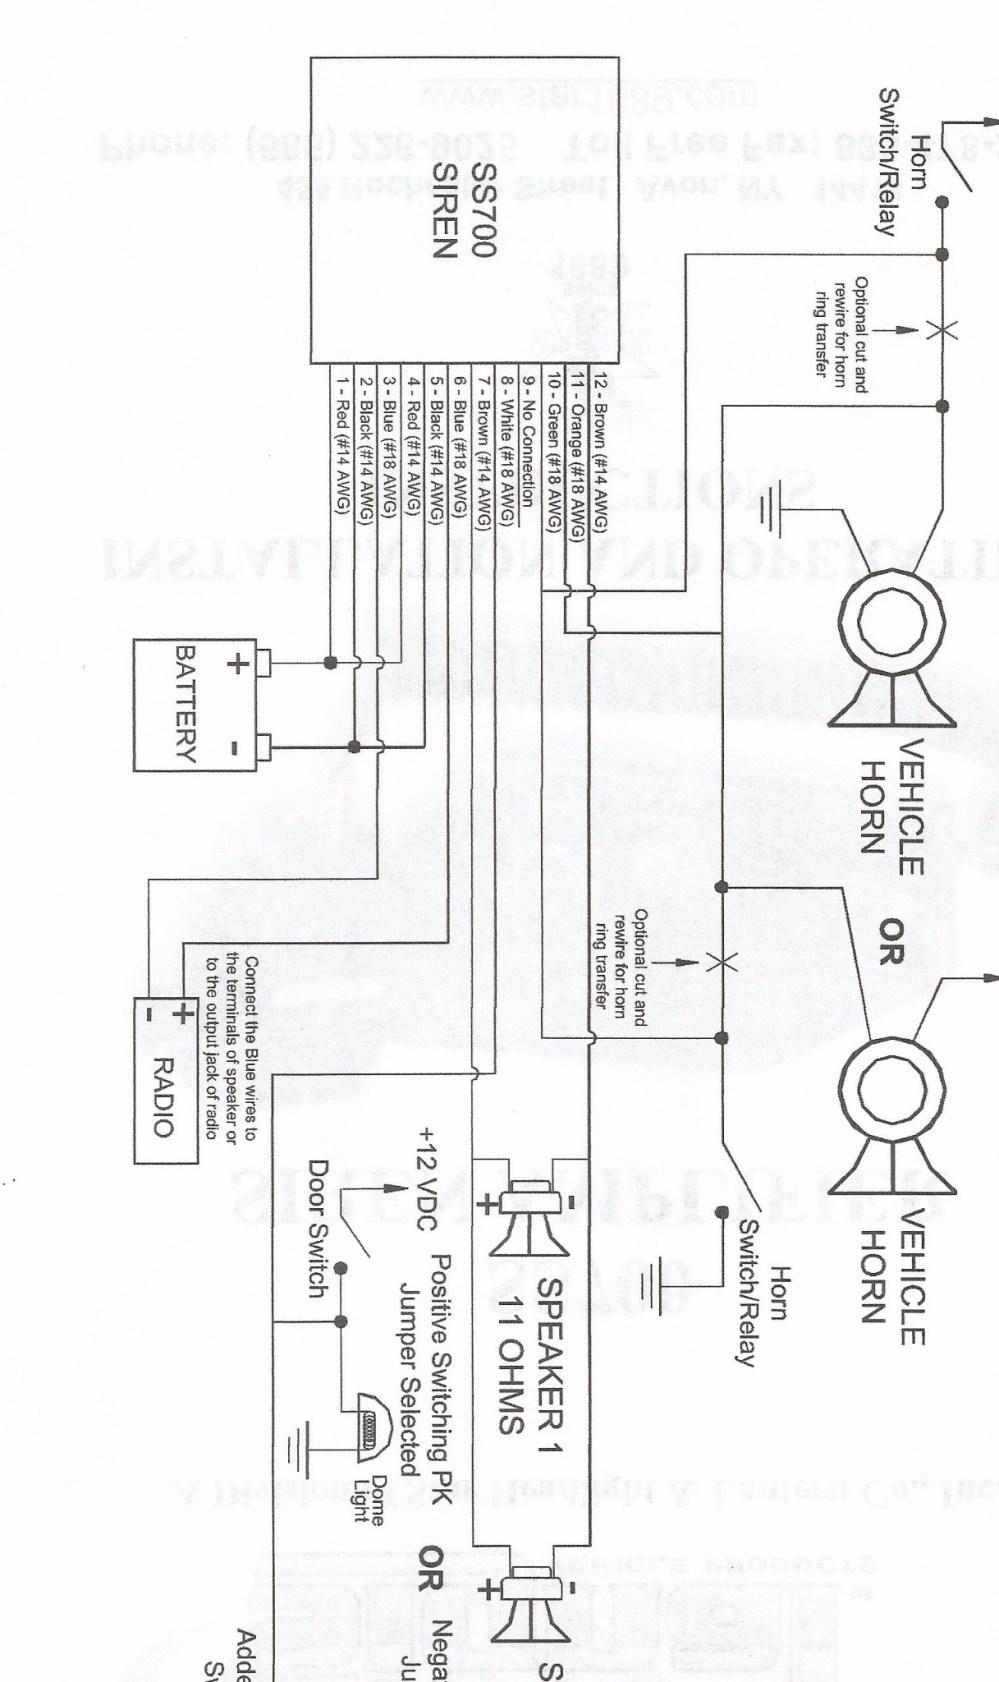 medium resolution of svp siren wiring diagram wiring diagram blog svp siren wiring diagram mace siren wiring diagram wiring